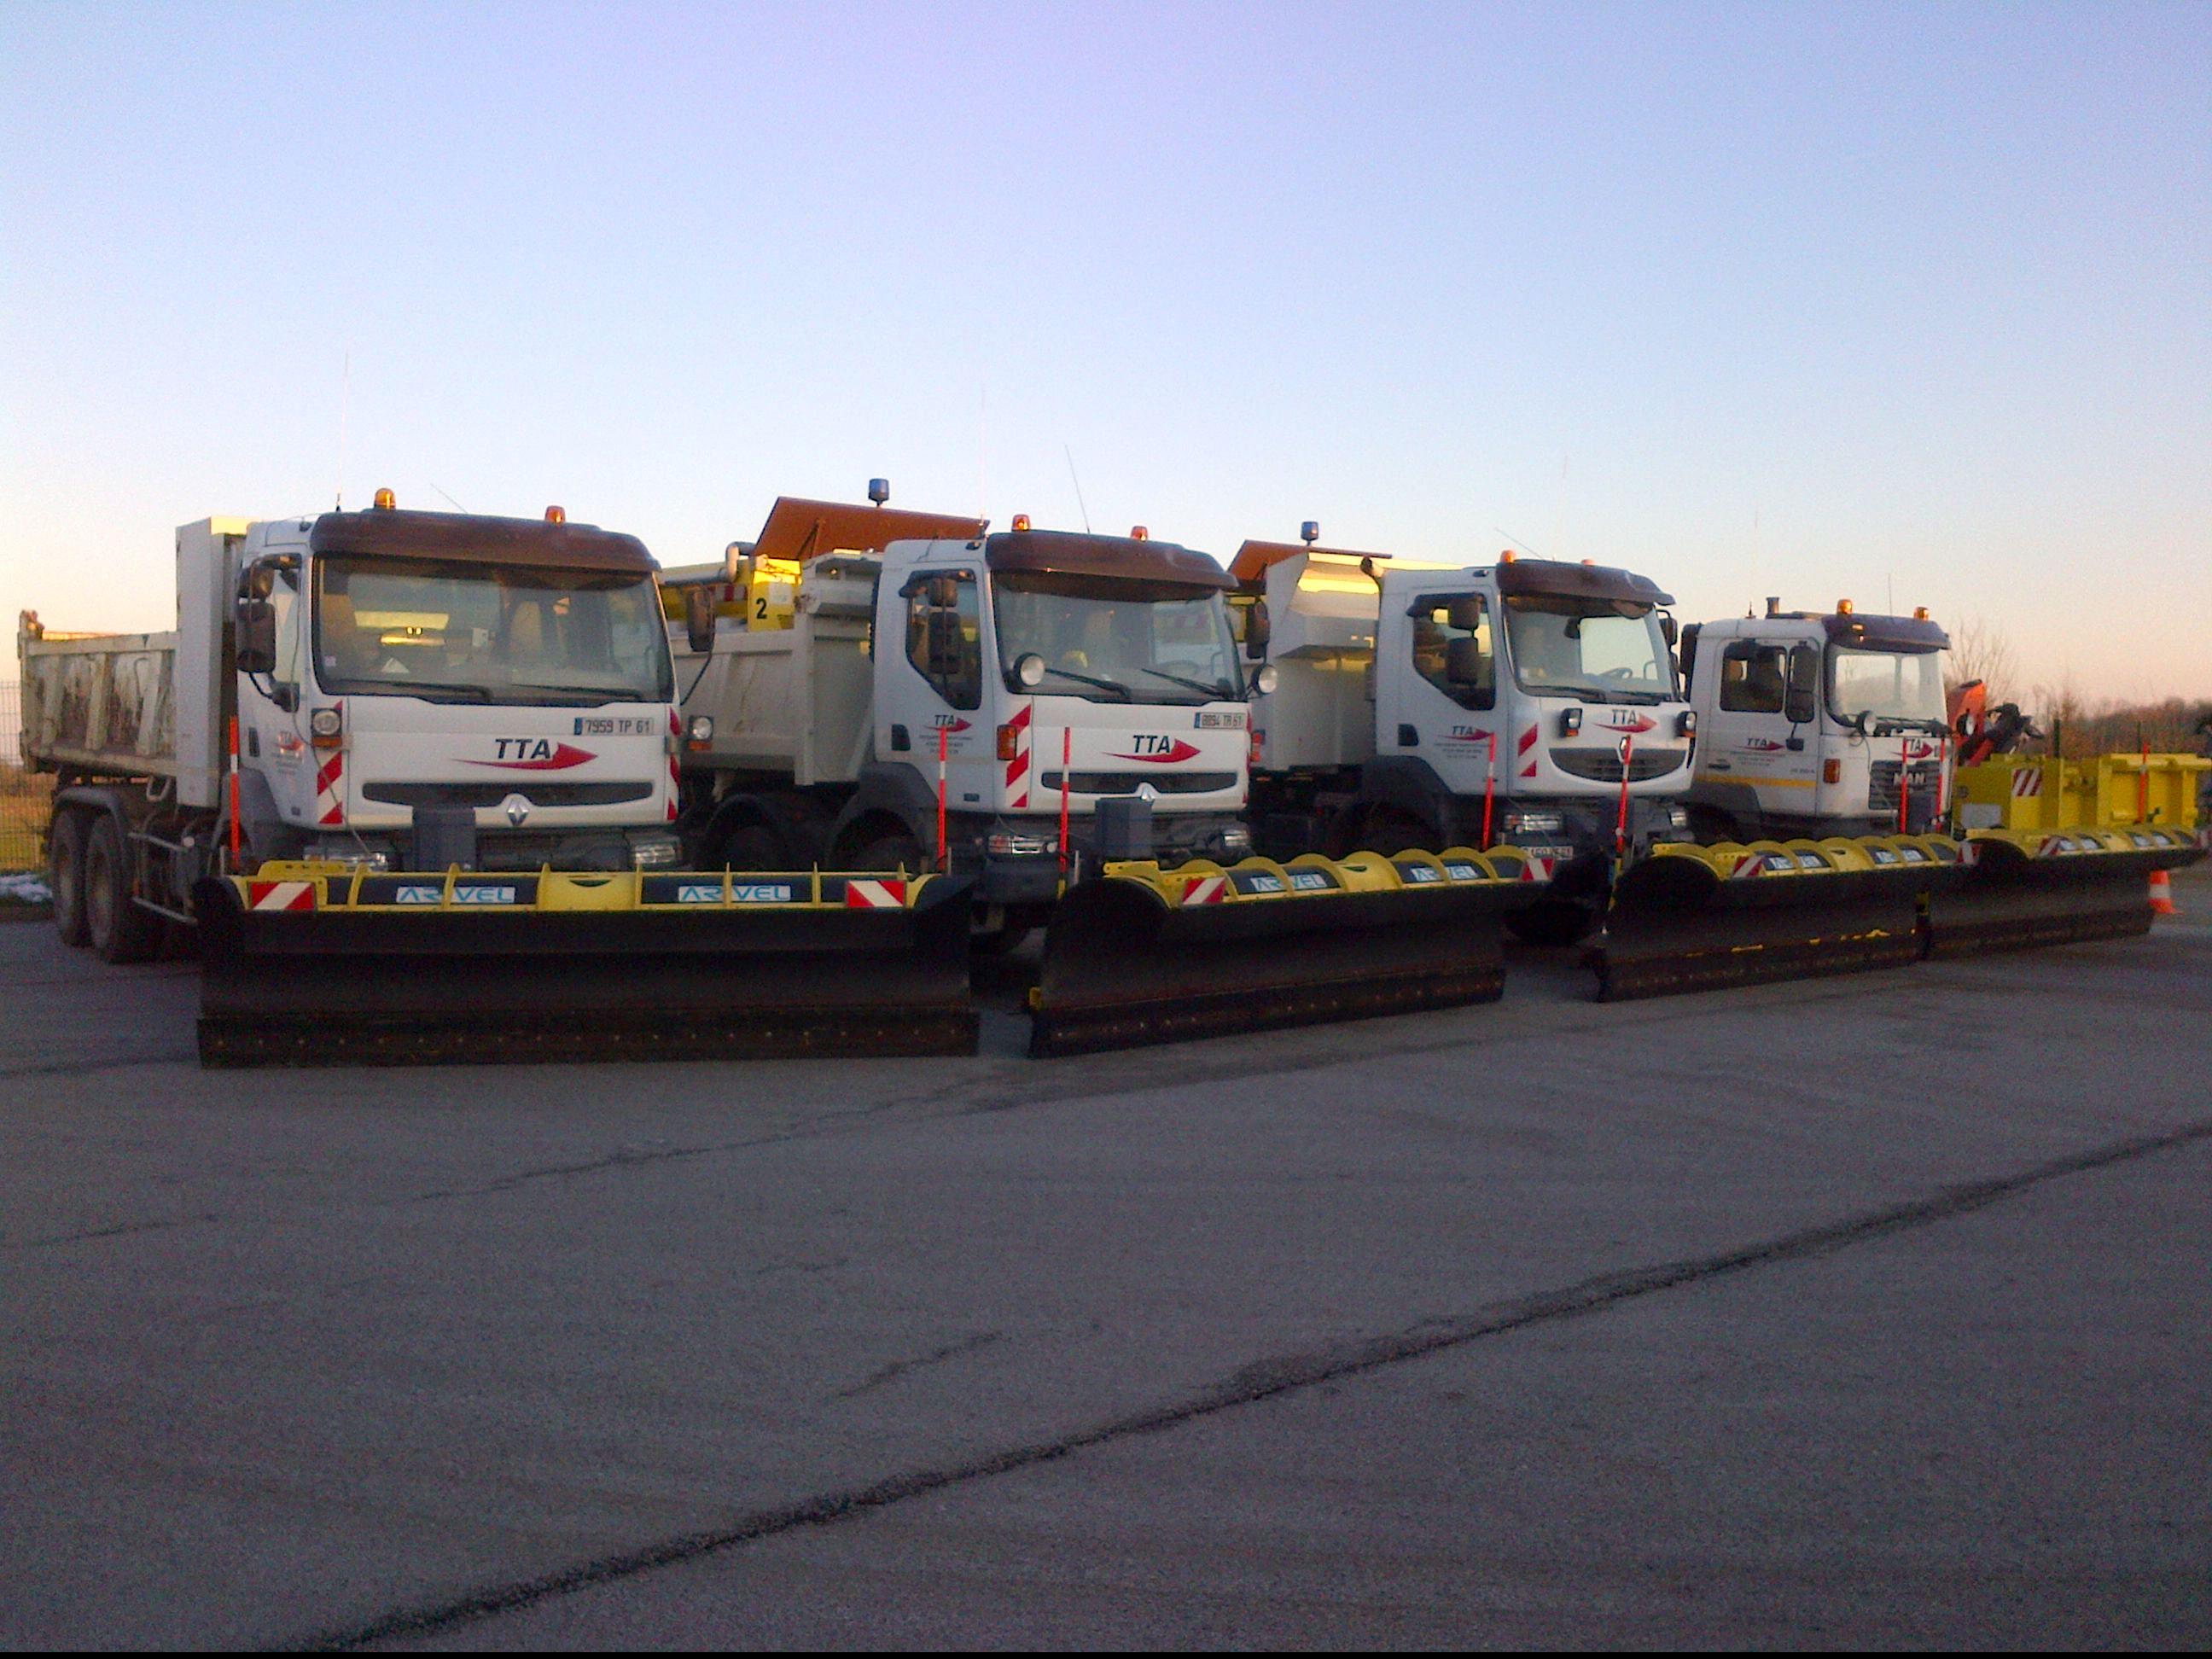 Camions deneigement - TTA